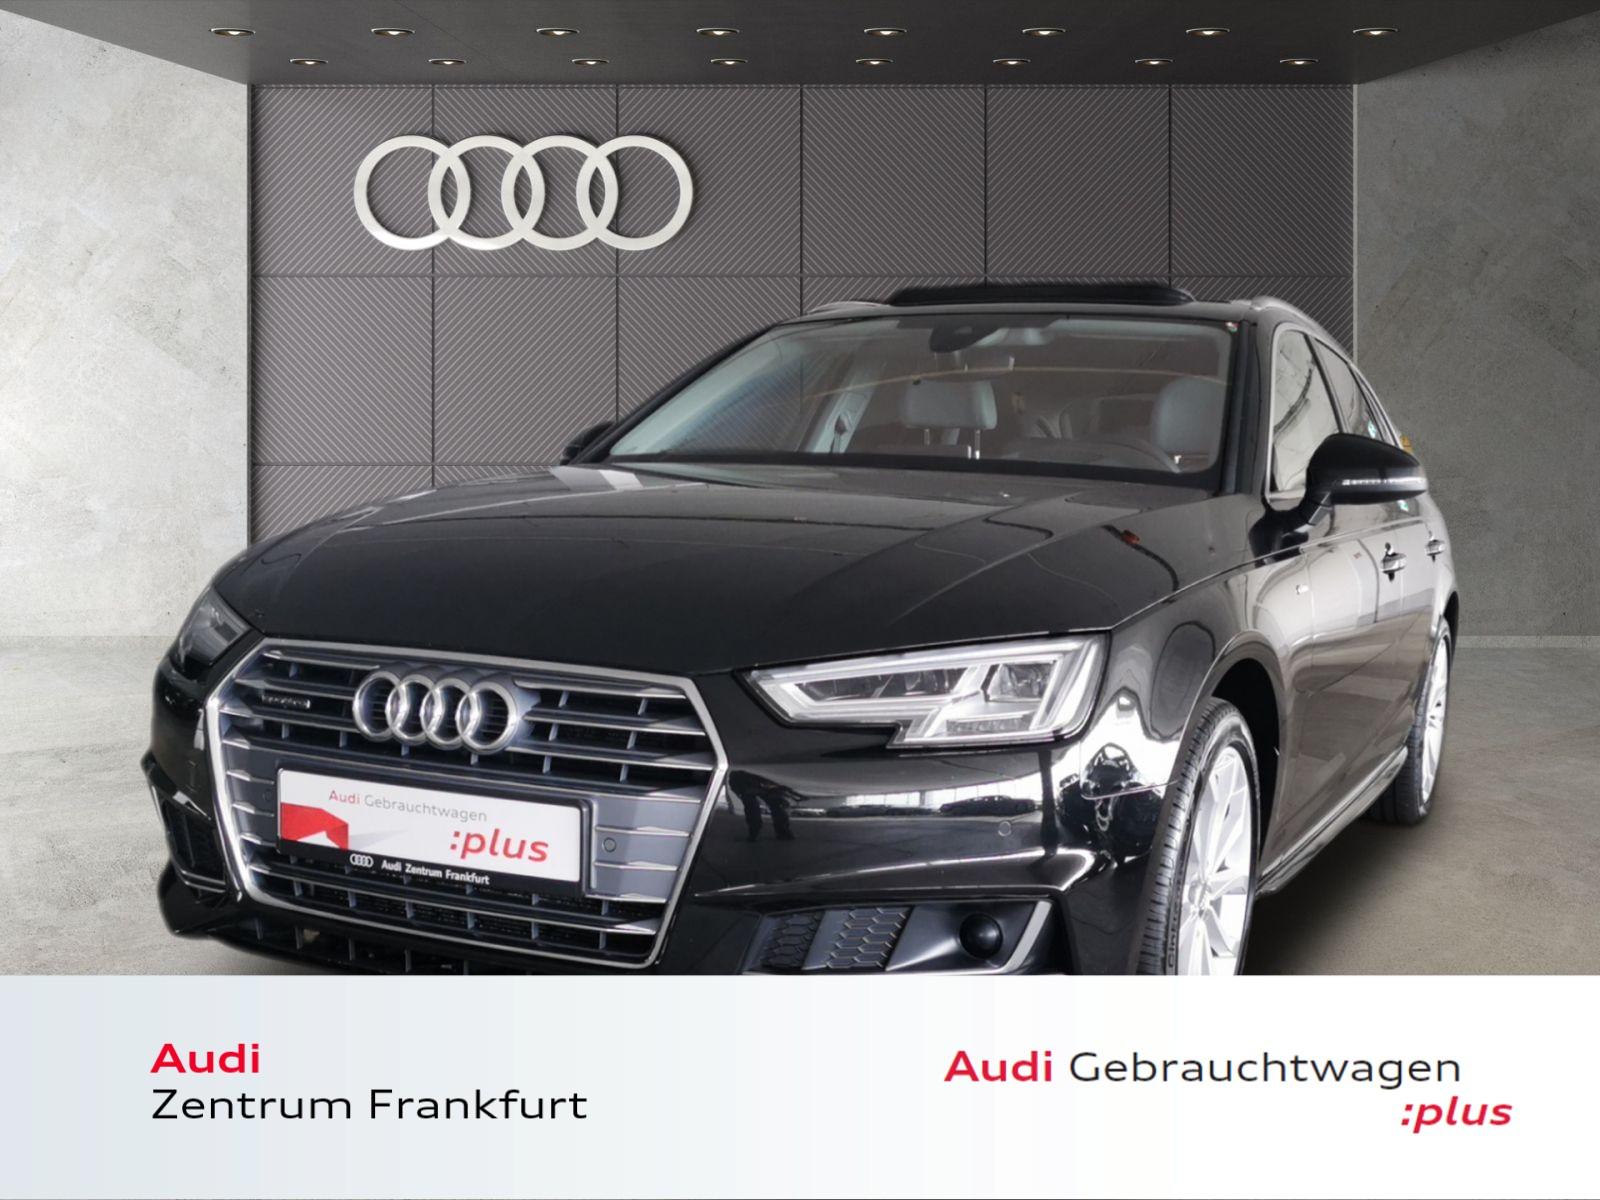 Audi A4 Avant 2.0 TDI quattro 2xS line Navi LED AHK Pano HuD, Jahr 2018, Diesel